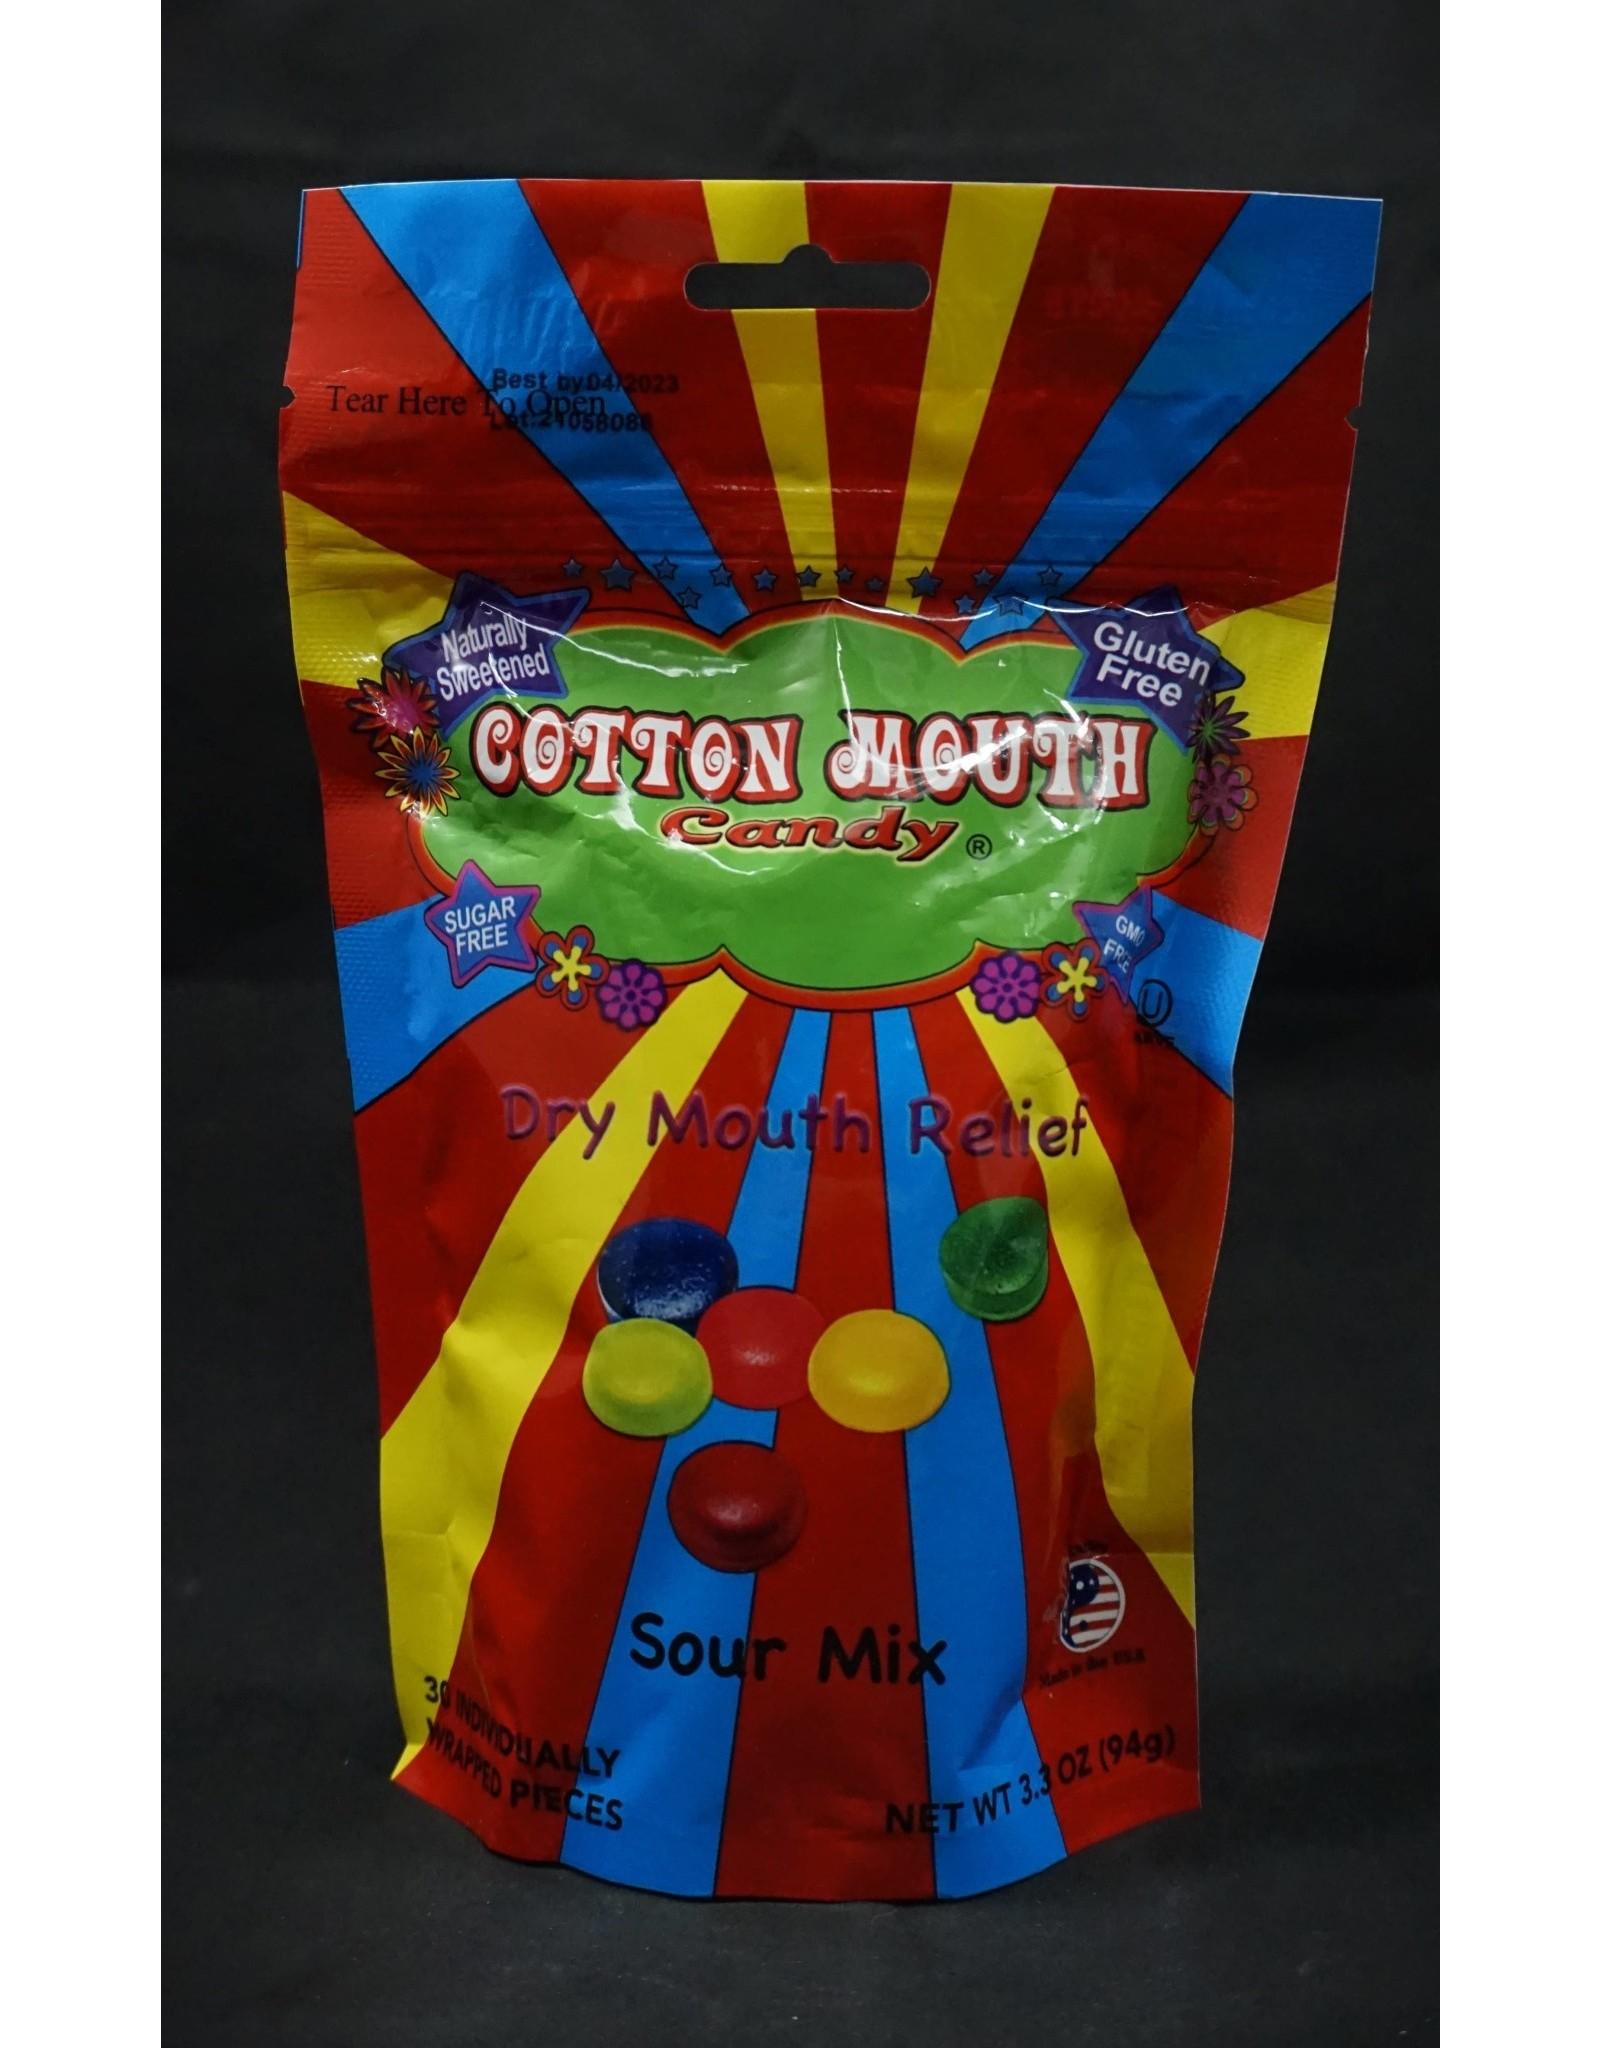 Cotton Mouth Candy - Sour Mix